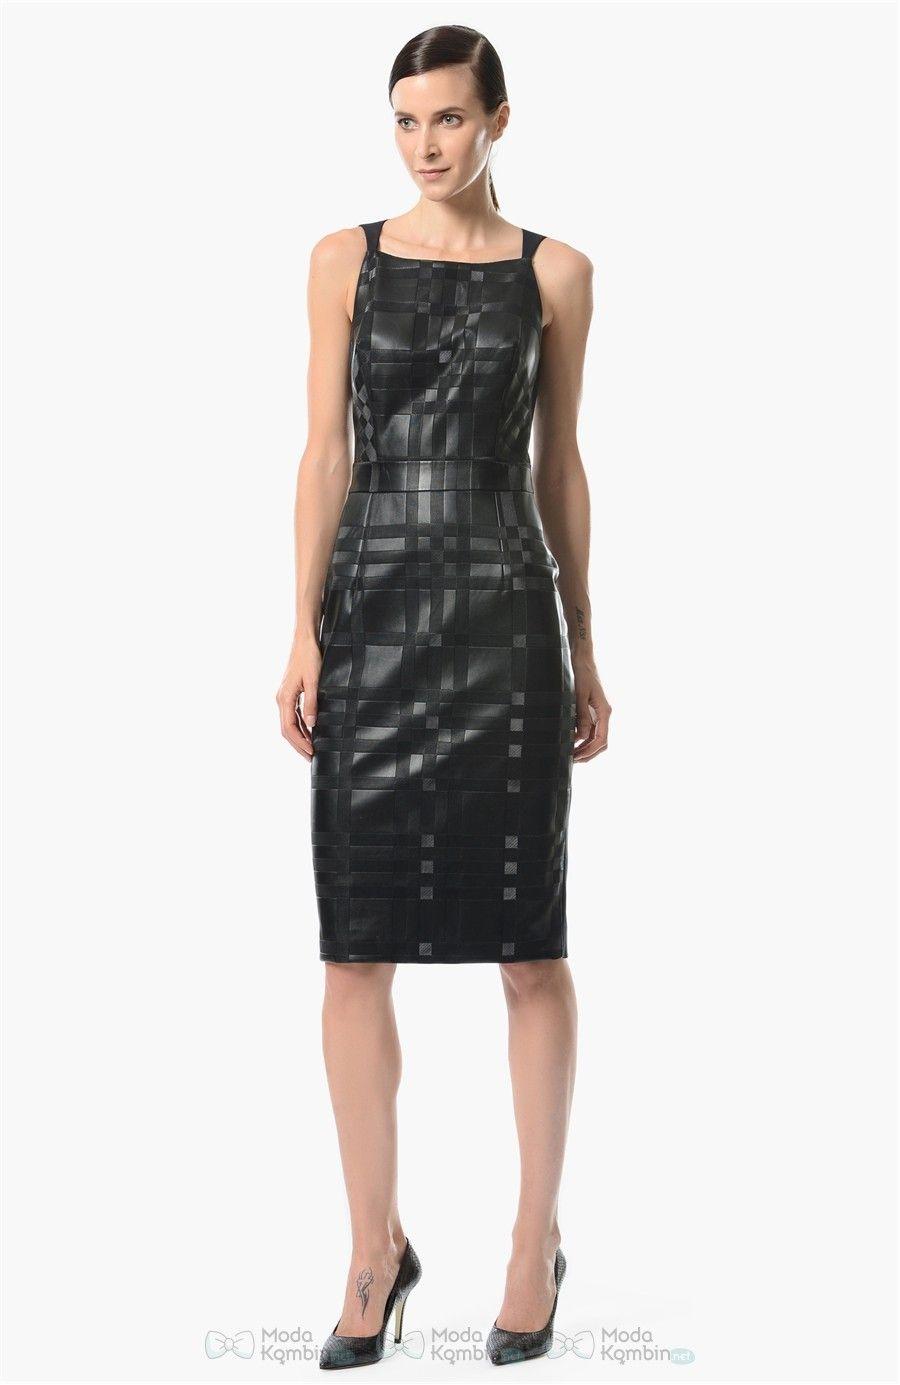 2017 Network Bayan Elbise Modelleri 2017networkbayanelbisemodasi 2017networkbayanelbisemodelleri Gunlukelbisemodell Elbise Modelleri Moda Stilleri Elbise